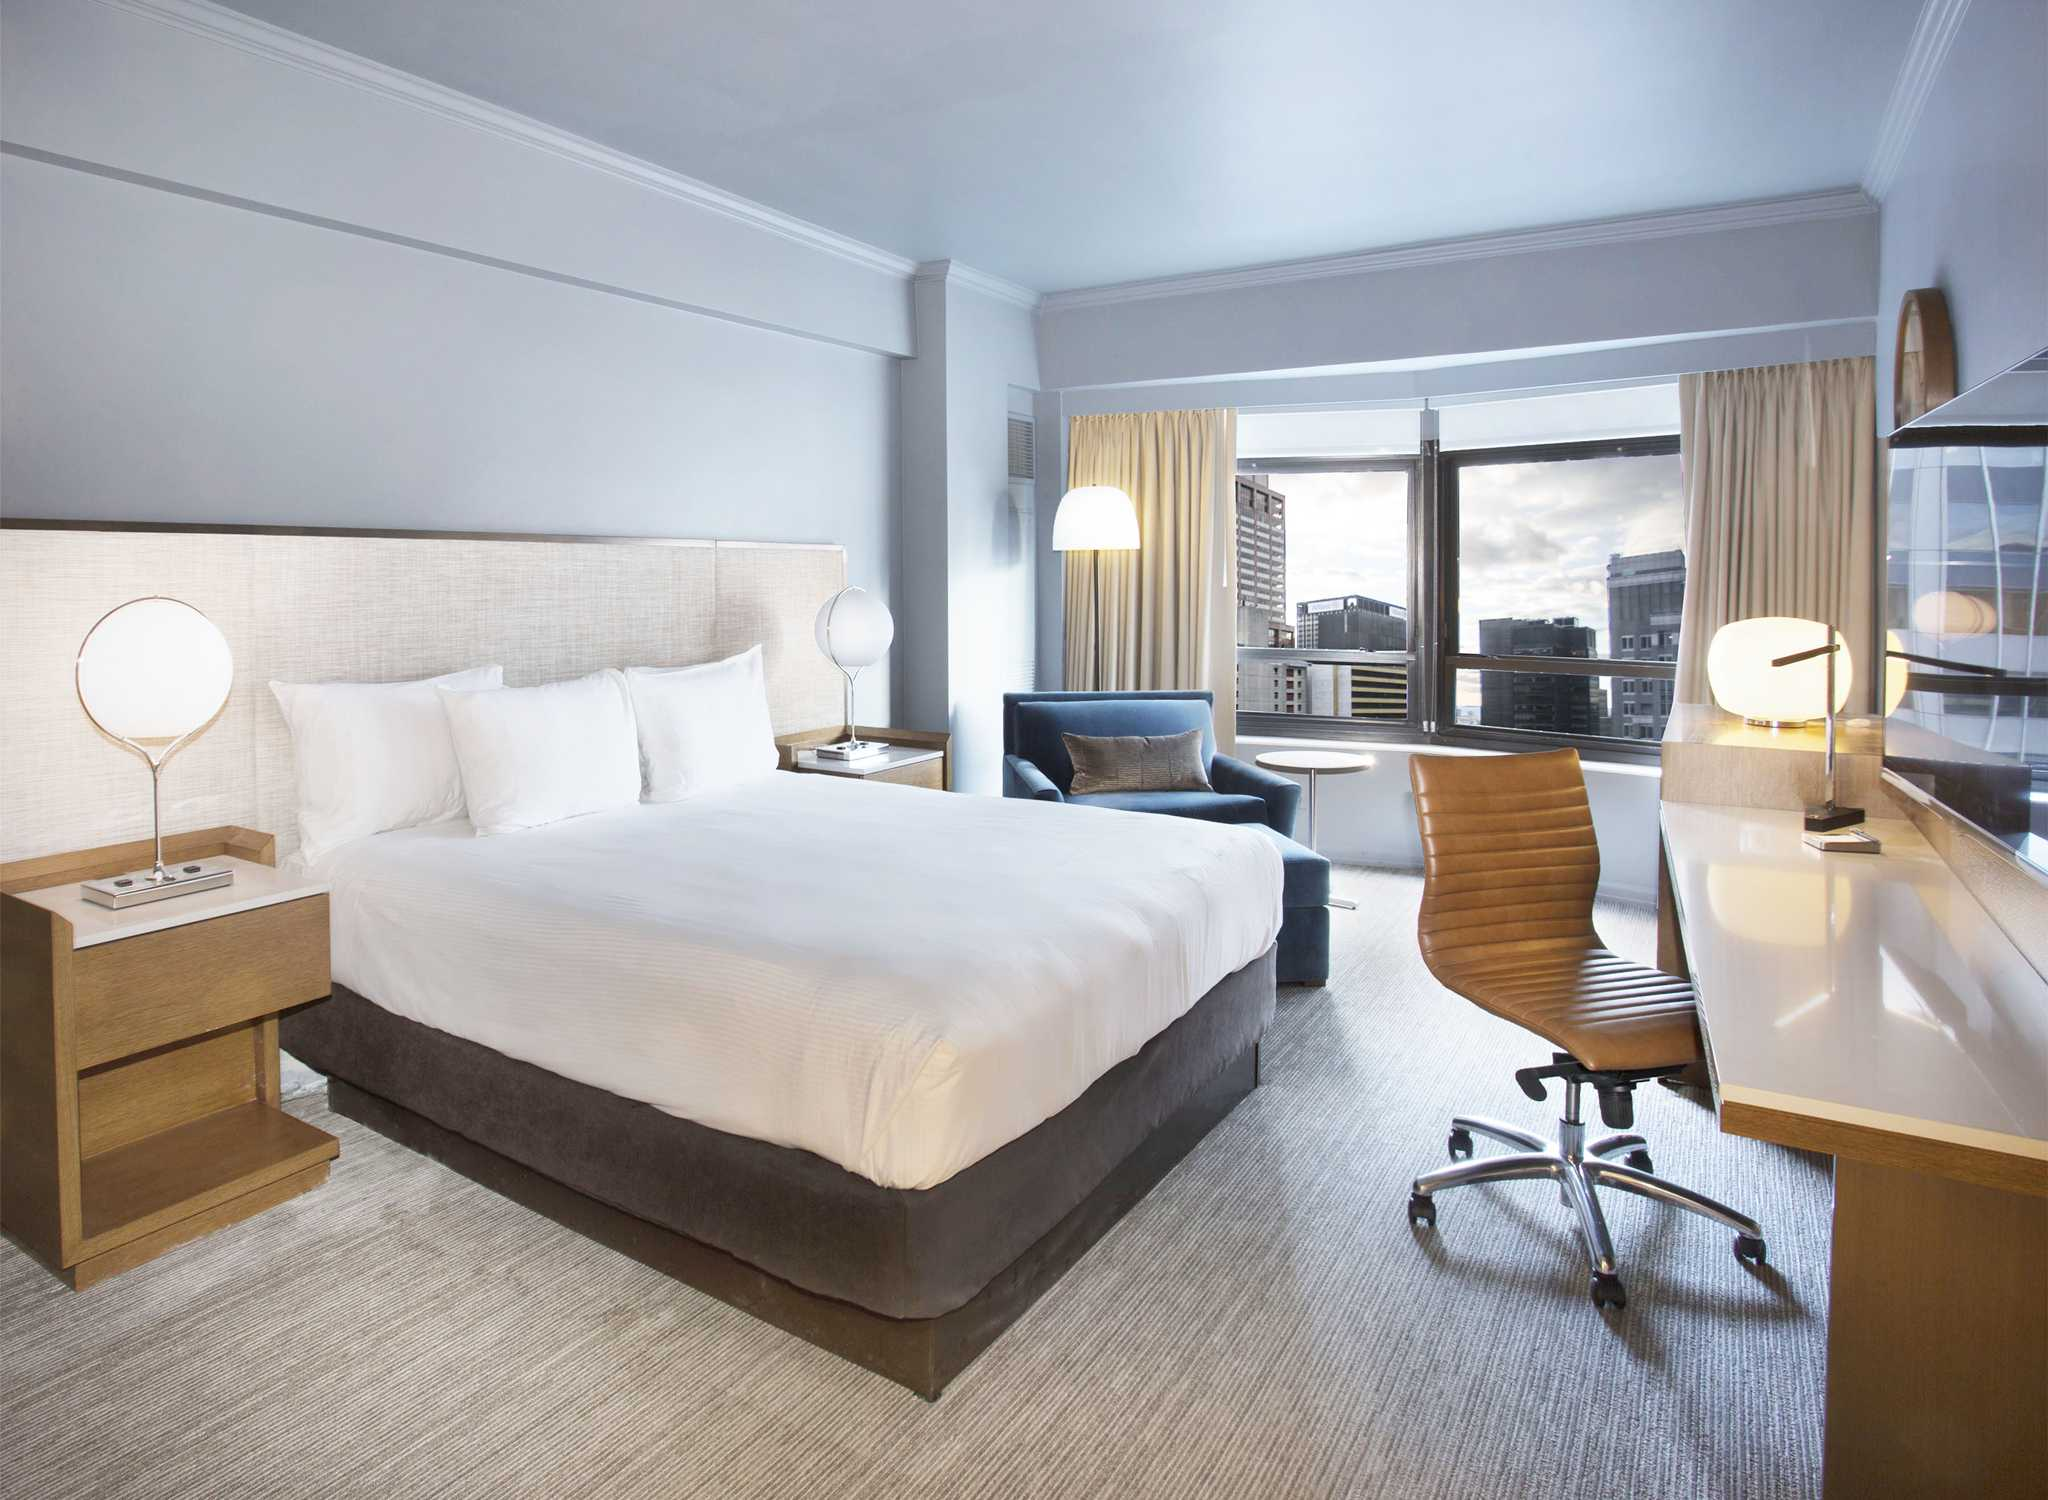 New york monroe county hilton - H Tel New York Hilton Midtown Tats Unis Suite Pr Sidentielle